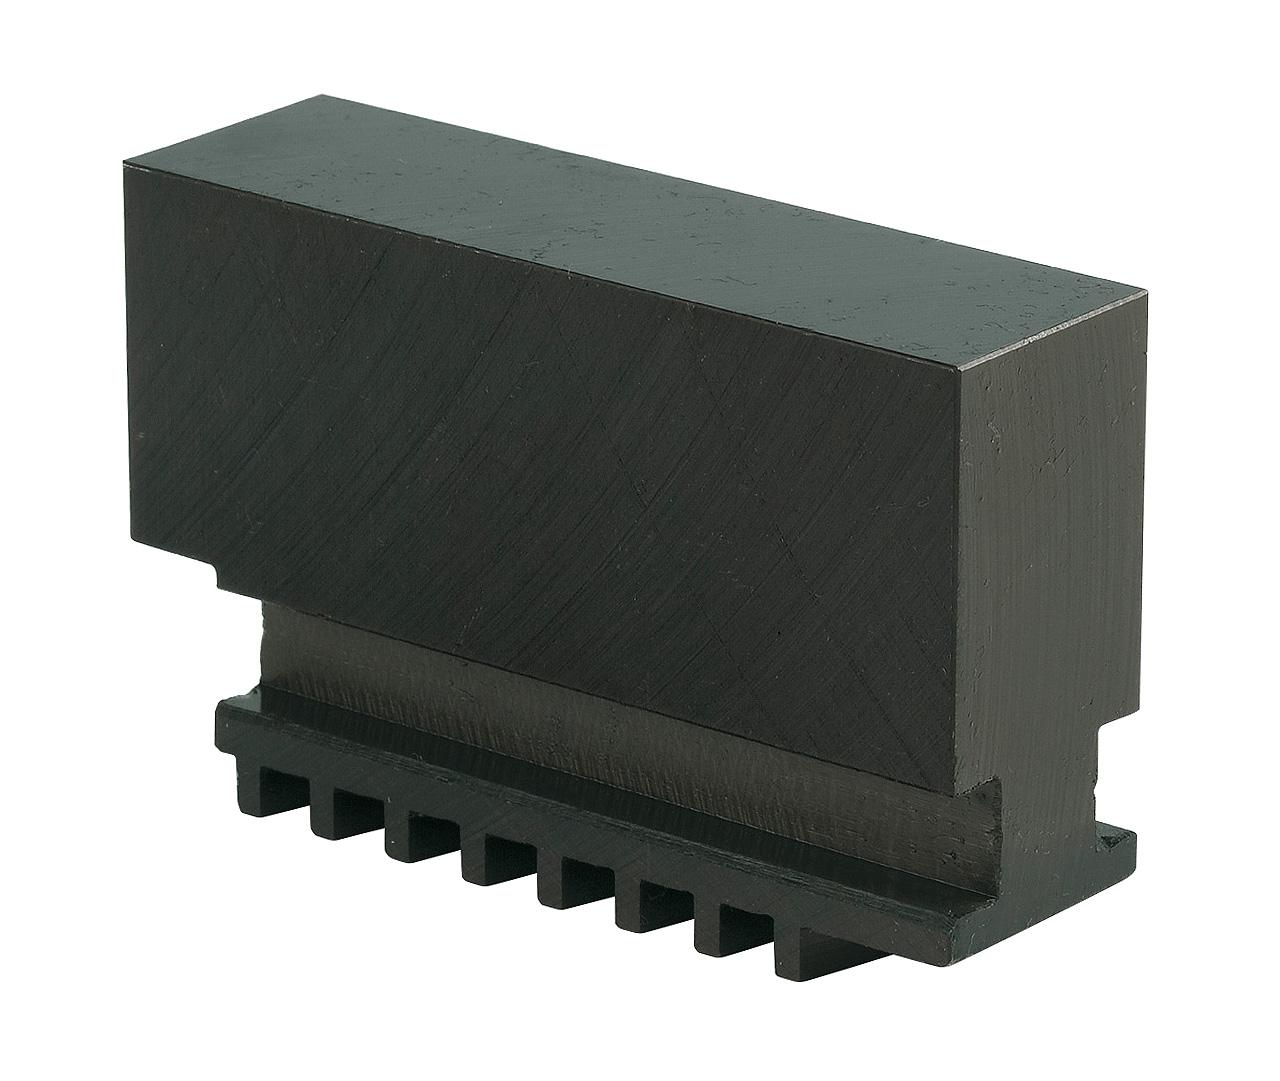 Szczęki jednolite miękkie - komplet SJ-PS3-630 BERNARDO